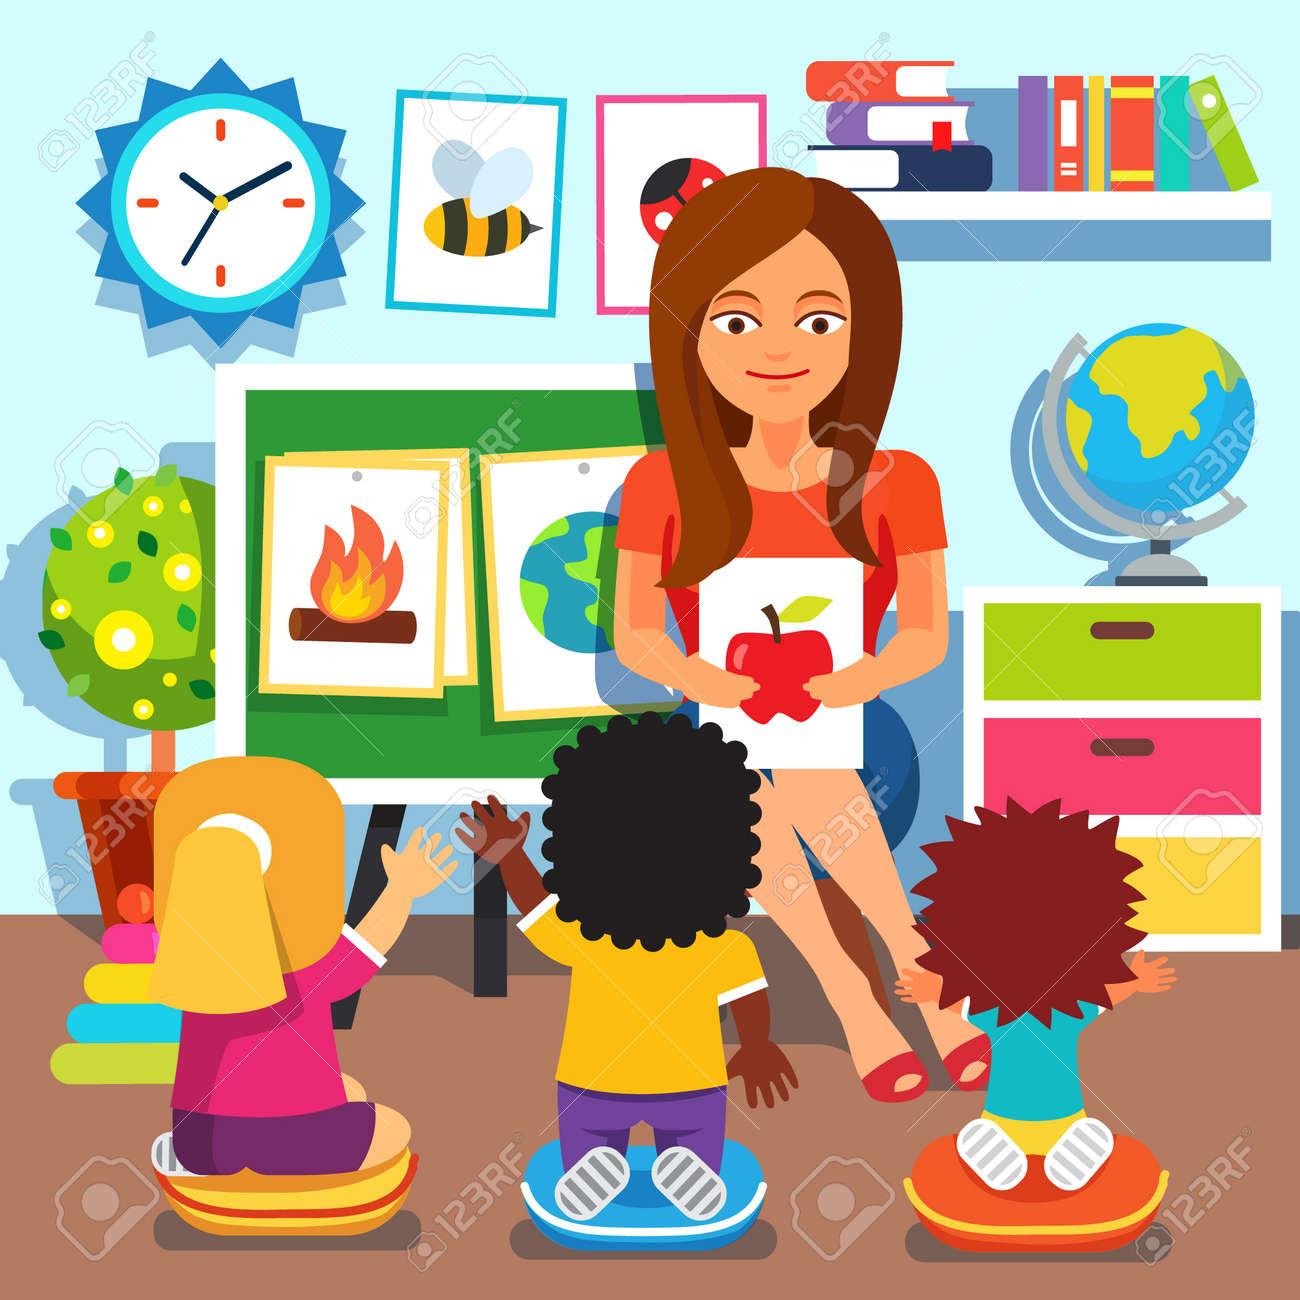 7 325 preschool classroom cliparts stock vector and royalty free rh 123rf com classroom clipart for teachers classroom clipart baby monkey